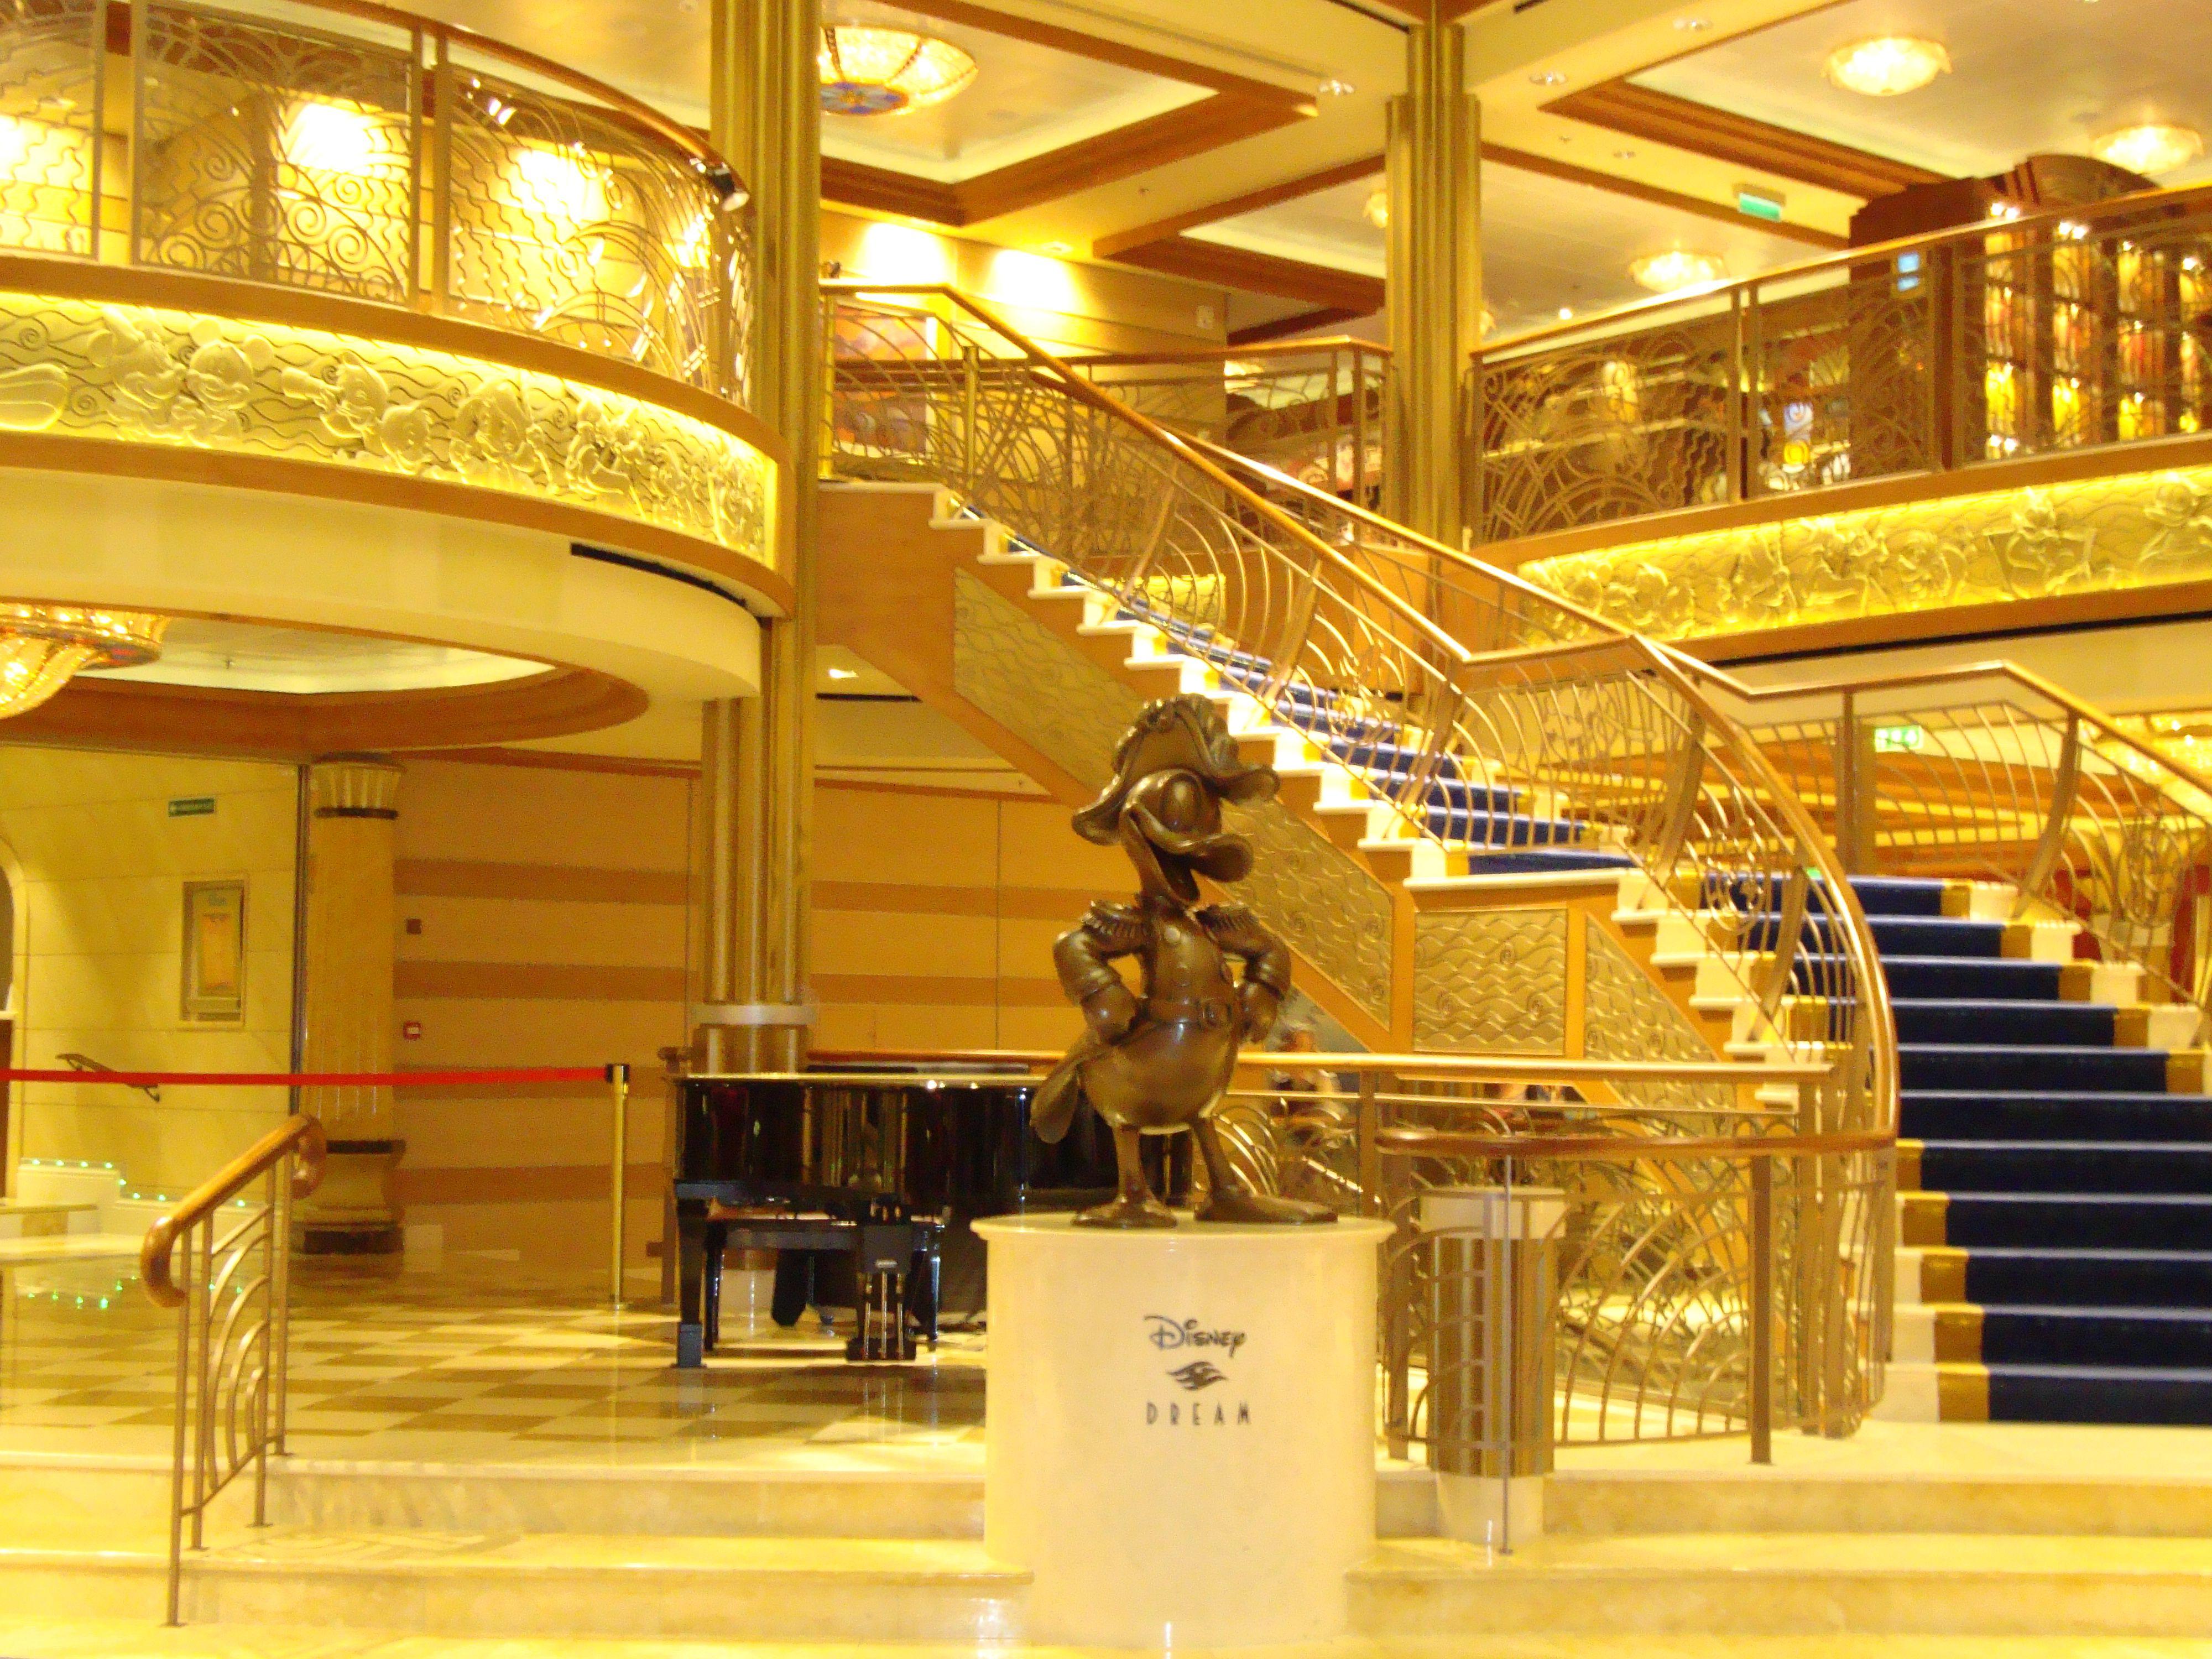 Disney Dream Atrium. CruiseWeddings WeddingsAtSea